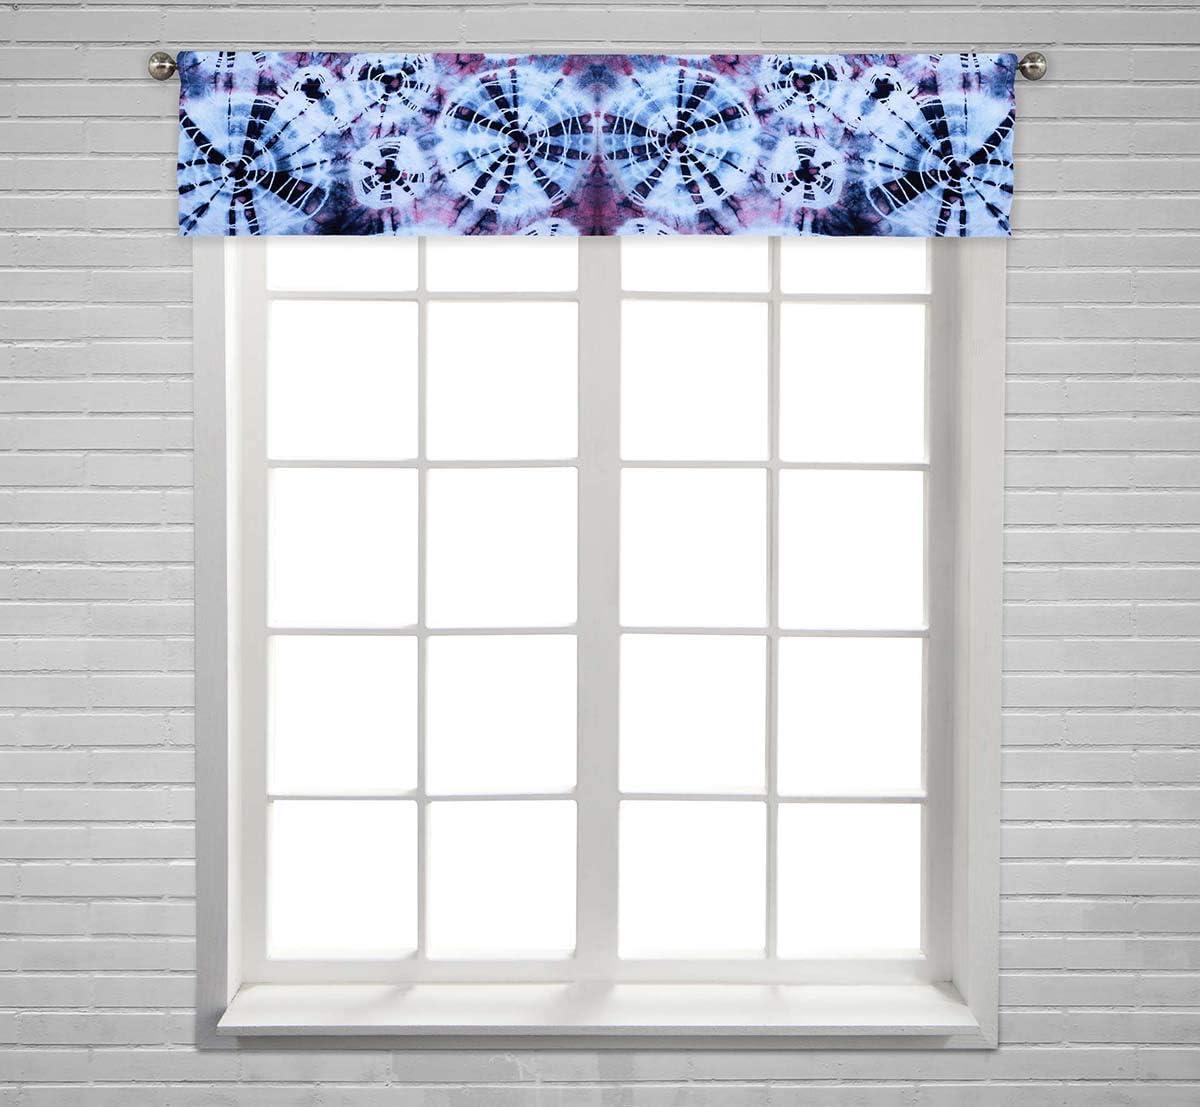 PKQWTM Tie Dye Pattern Window Curtain Valance Rod Pocket 54×12 inch